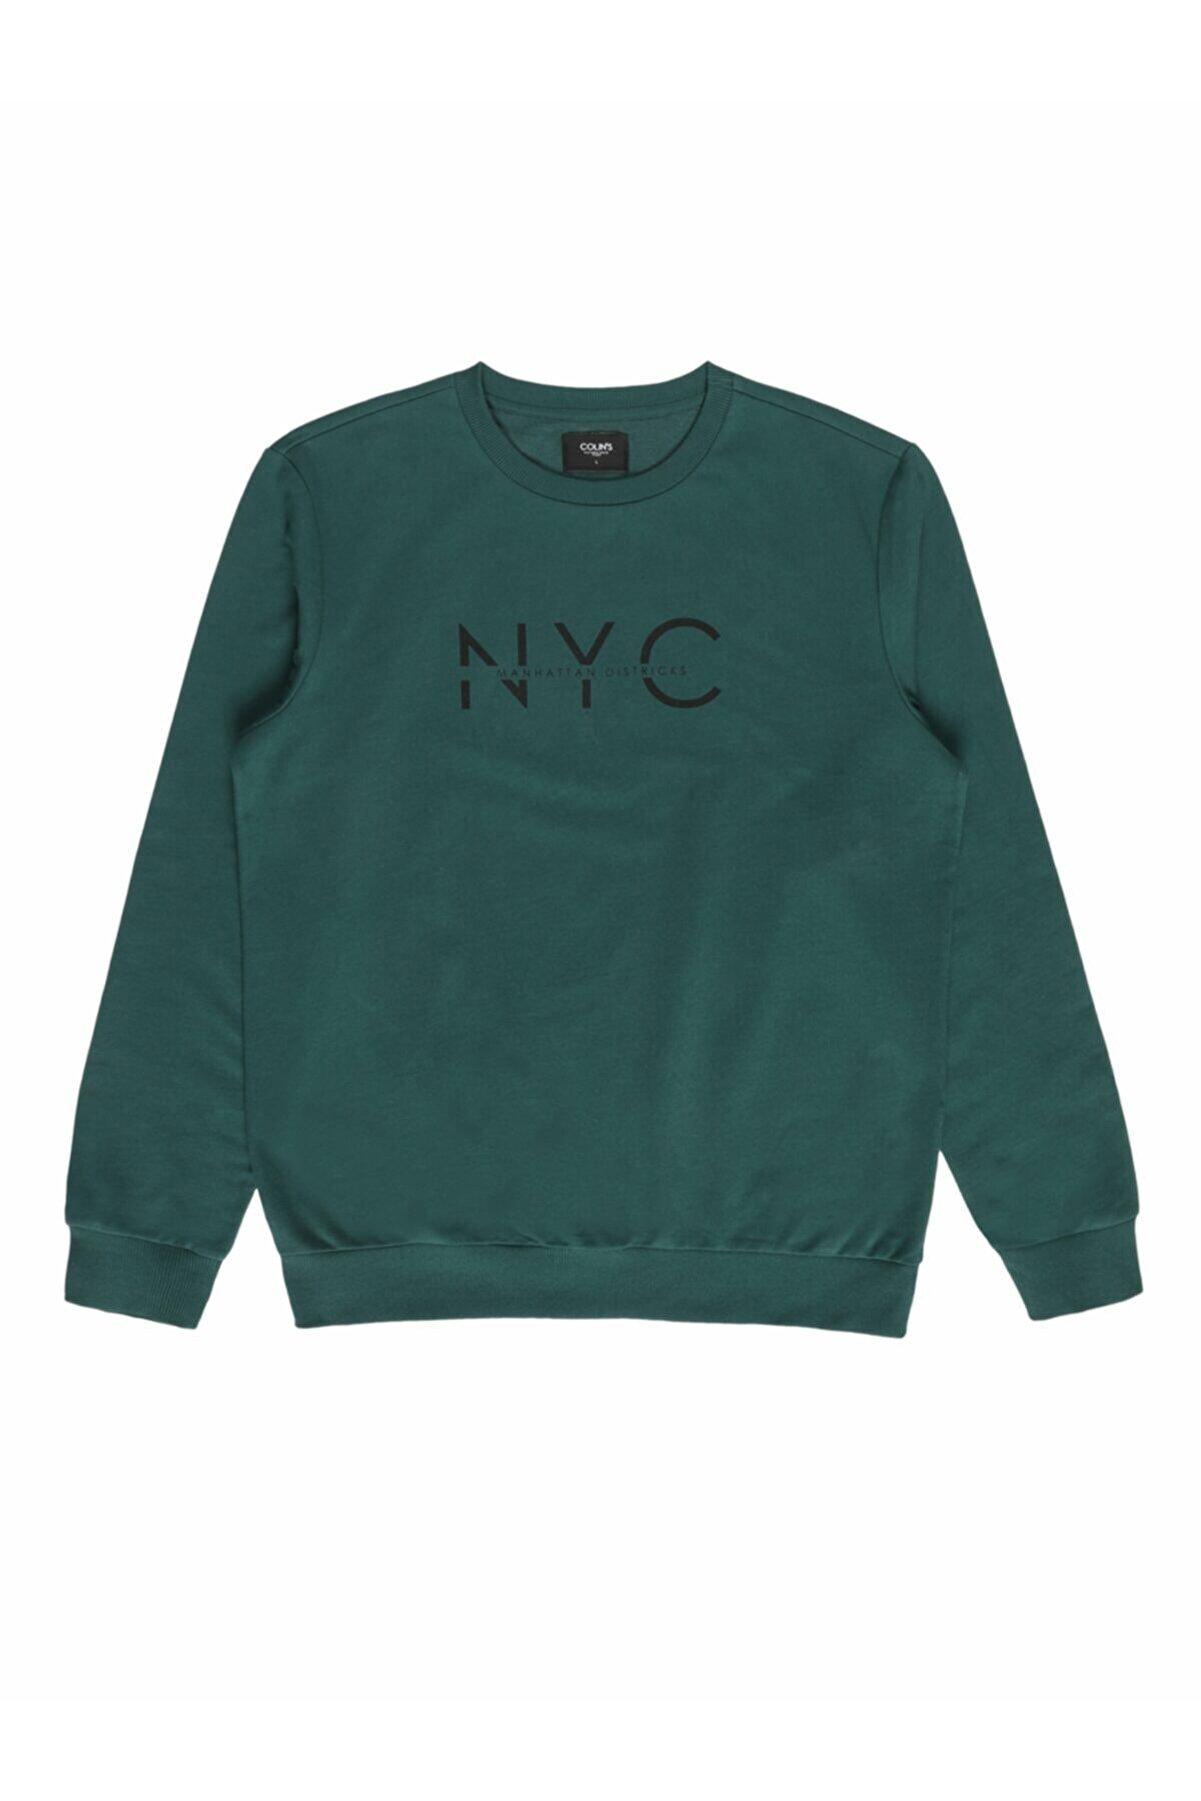 Colin's ERKEK Regular Fit Erkek Yeşil Sweatshirt CL1054823